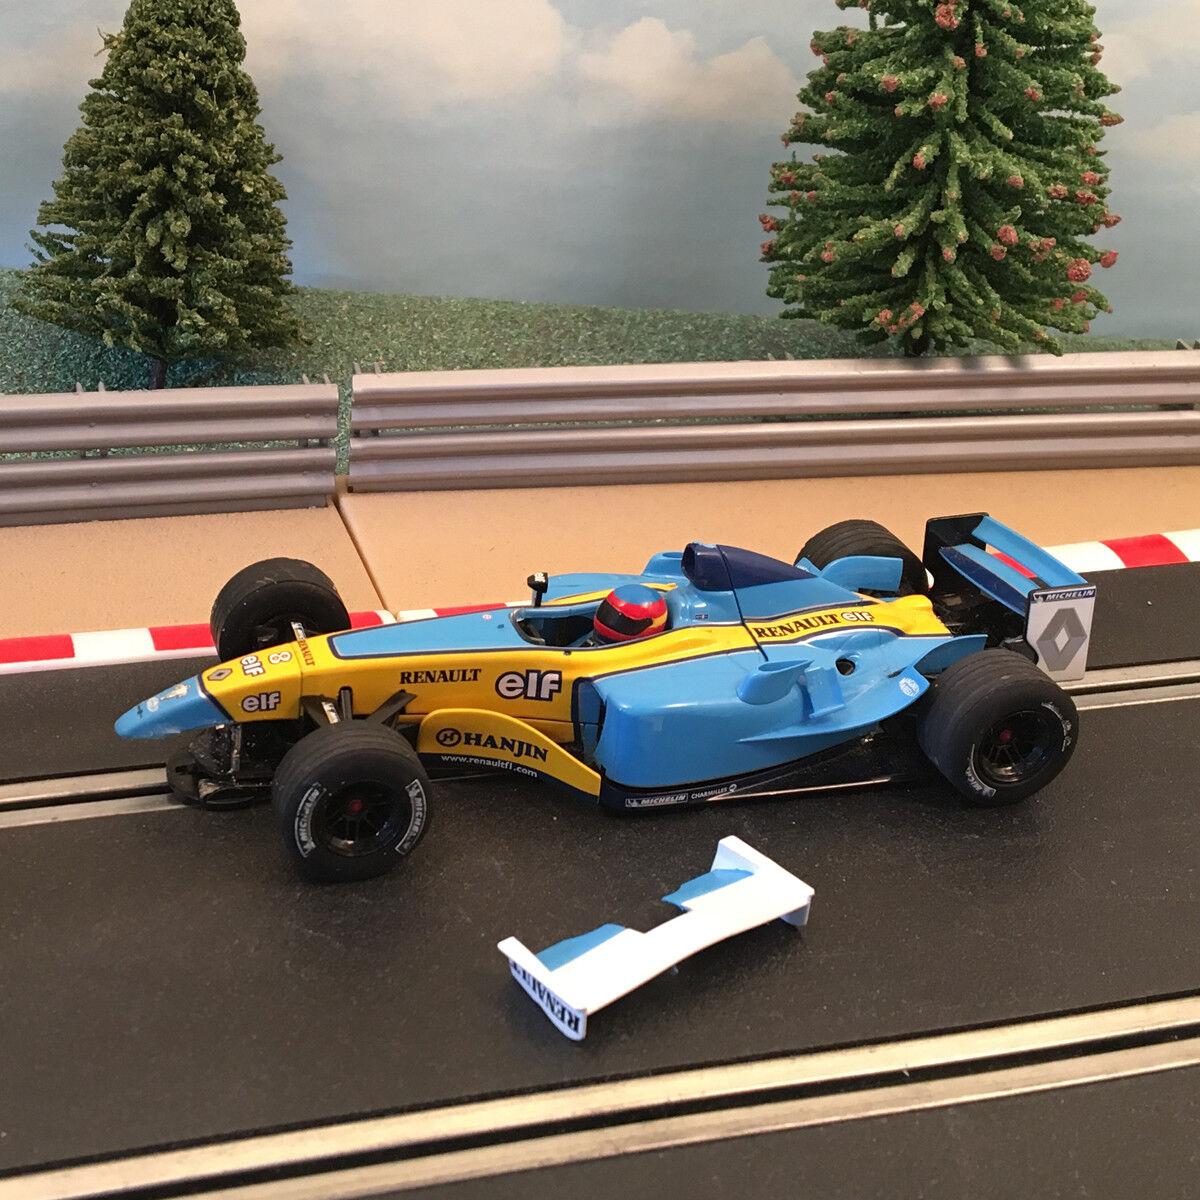 Scalextric 1 32 Car - F1 Renault elf  A